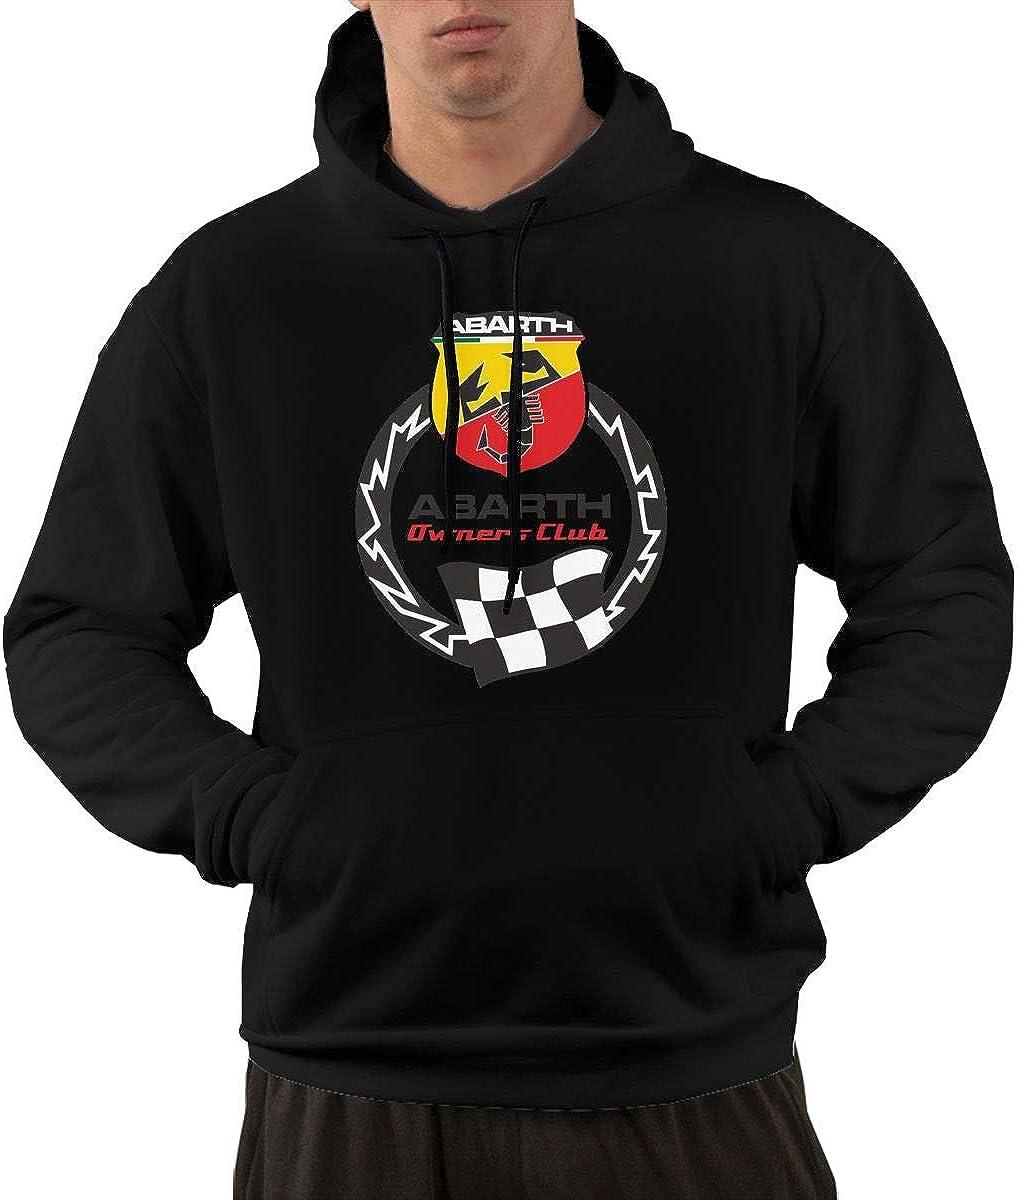 Hengteng Men Casual Abarth Club Logo Hoodies Black